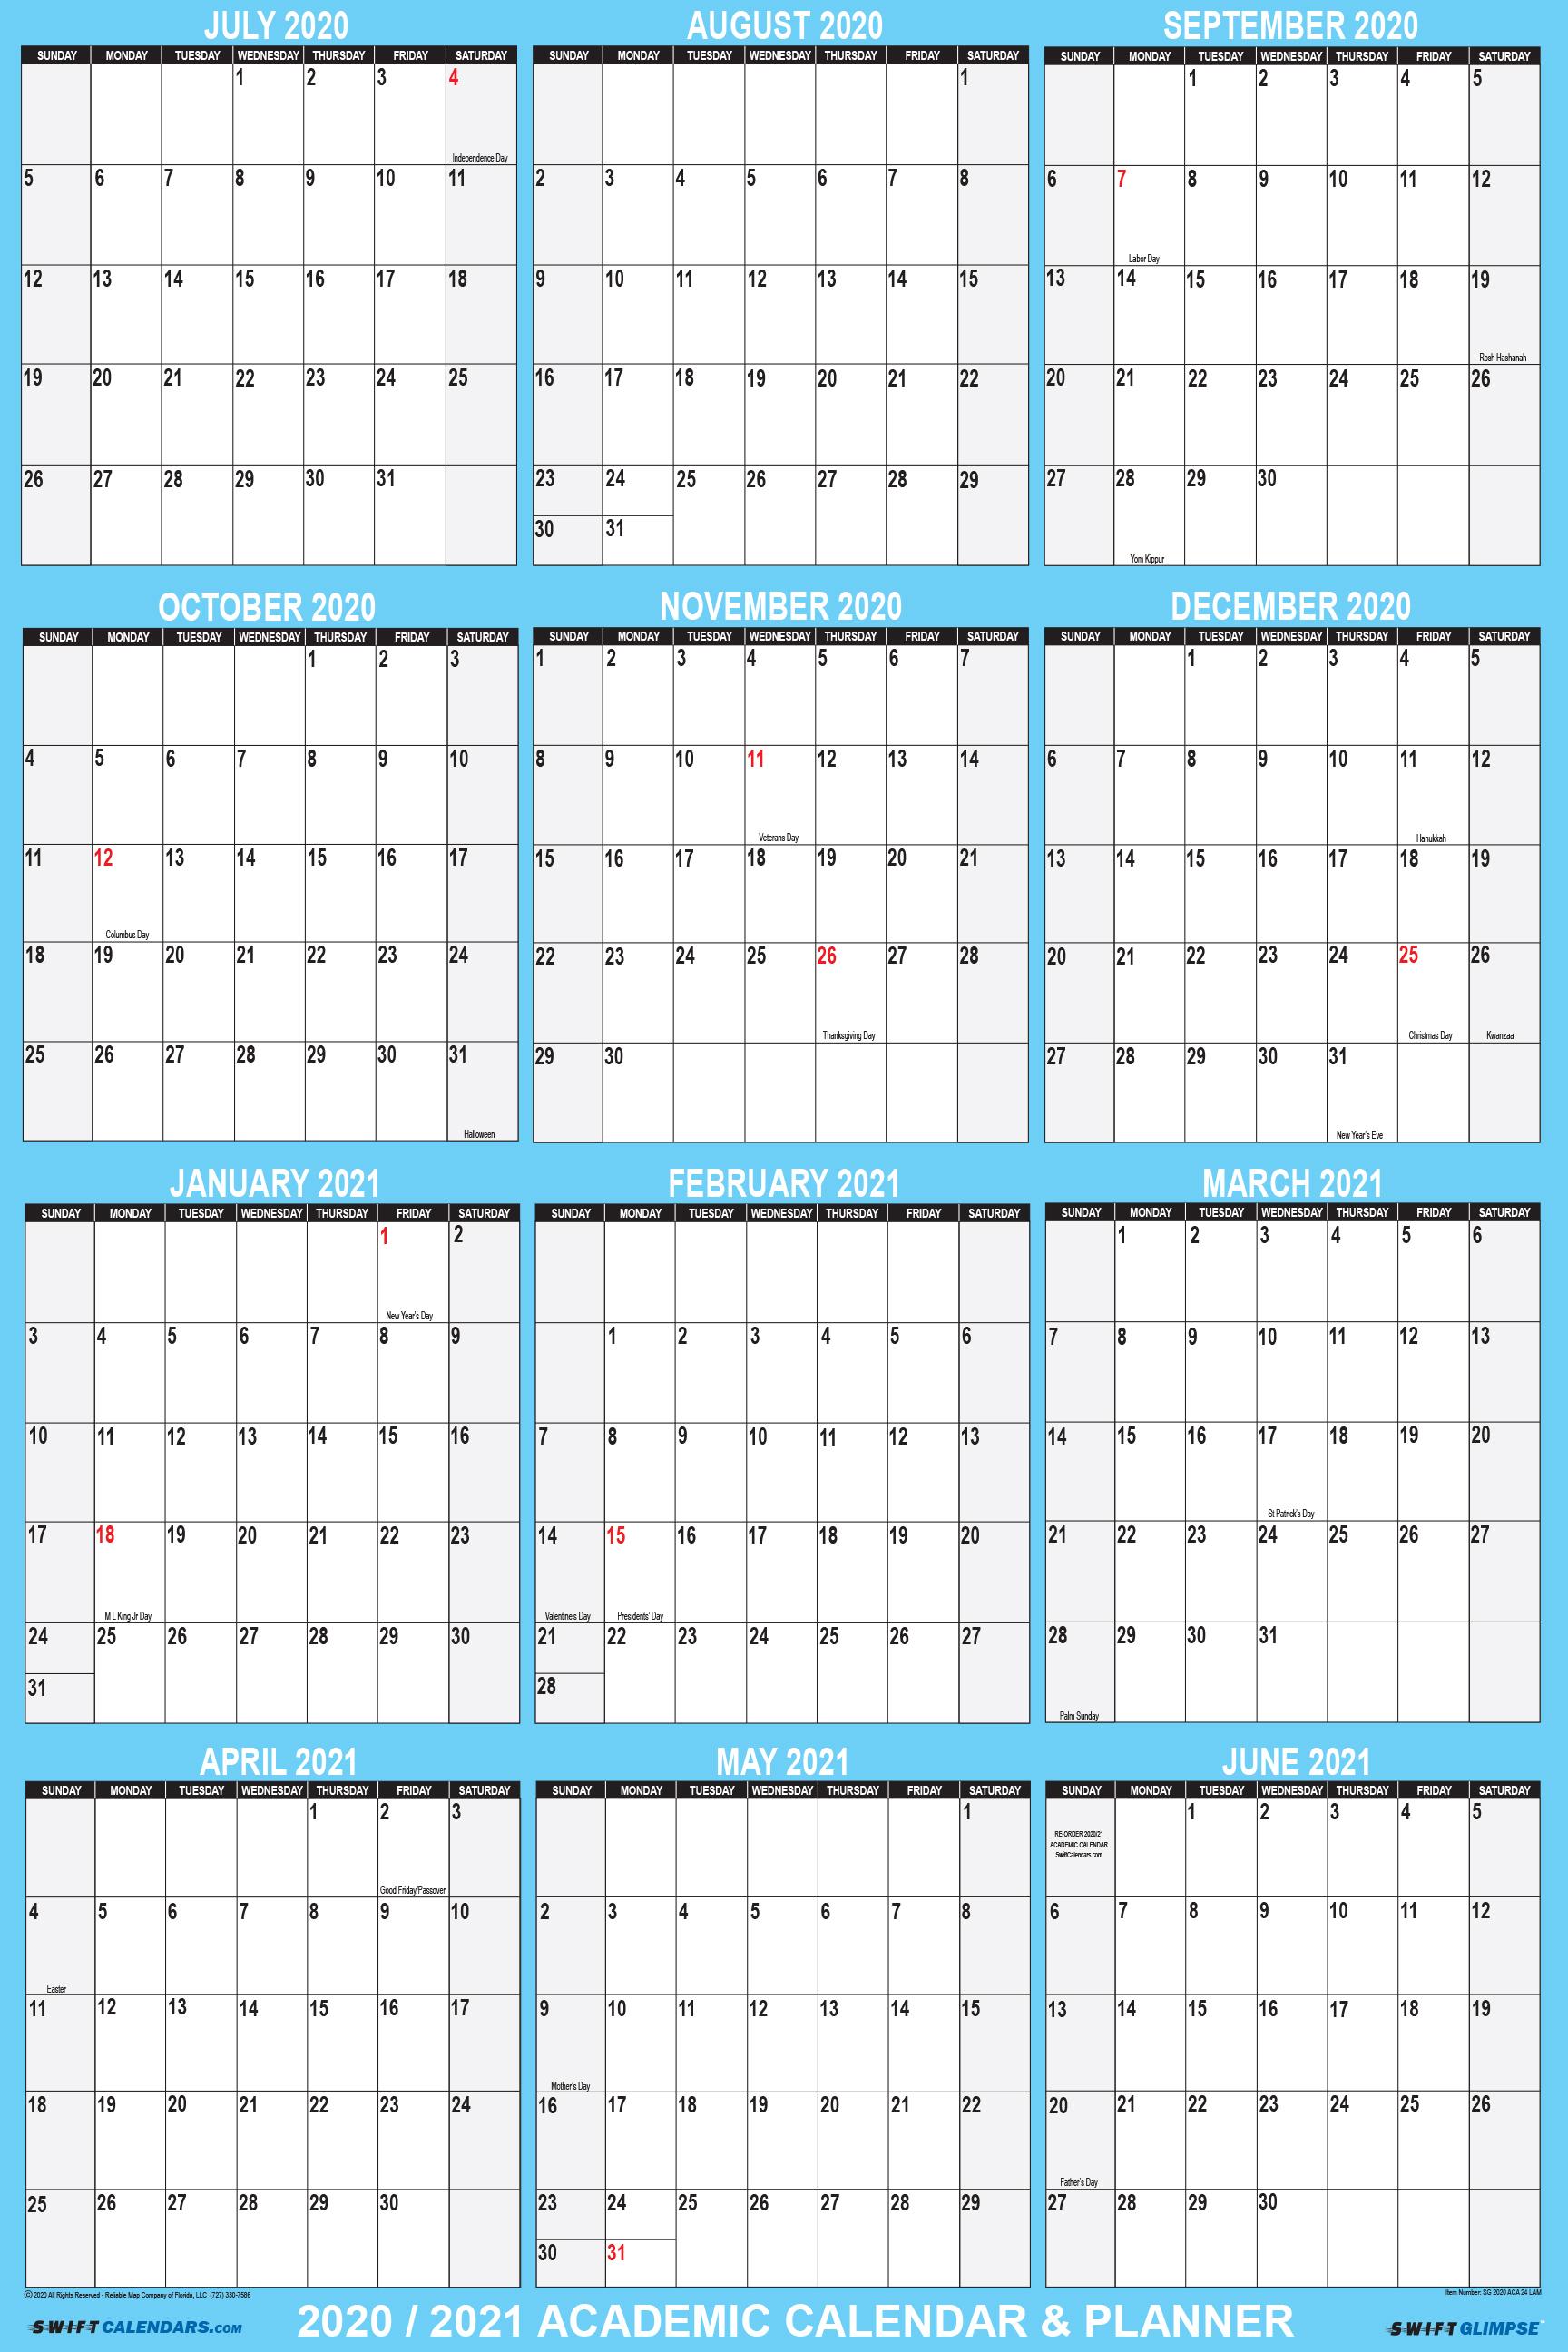 2021 Planning Calendar 2020 2021 Academic Planning Calendar 18